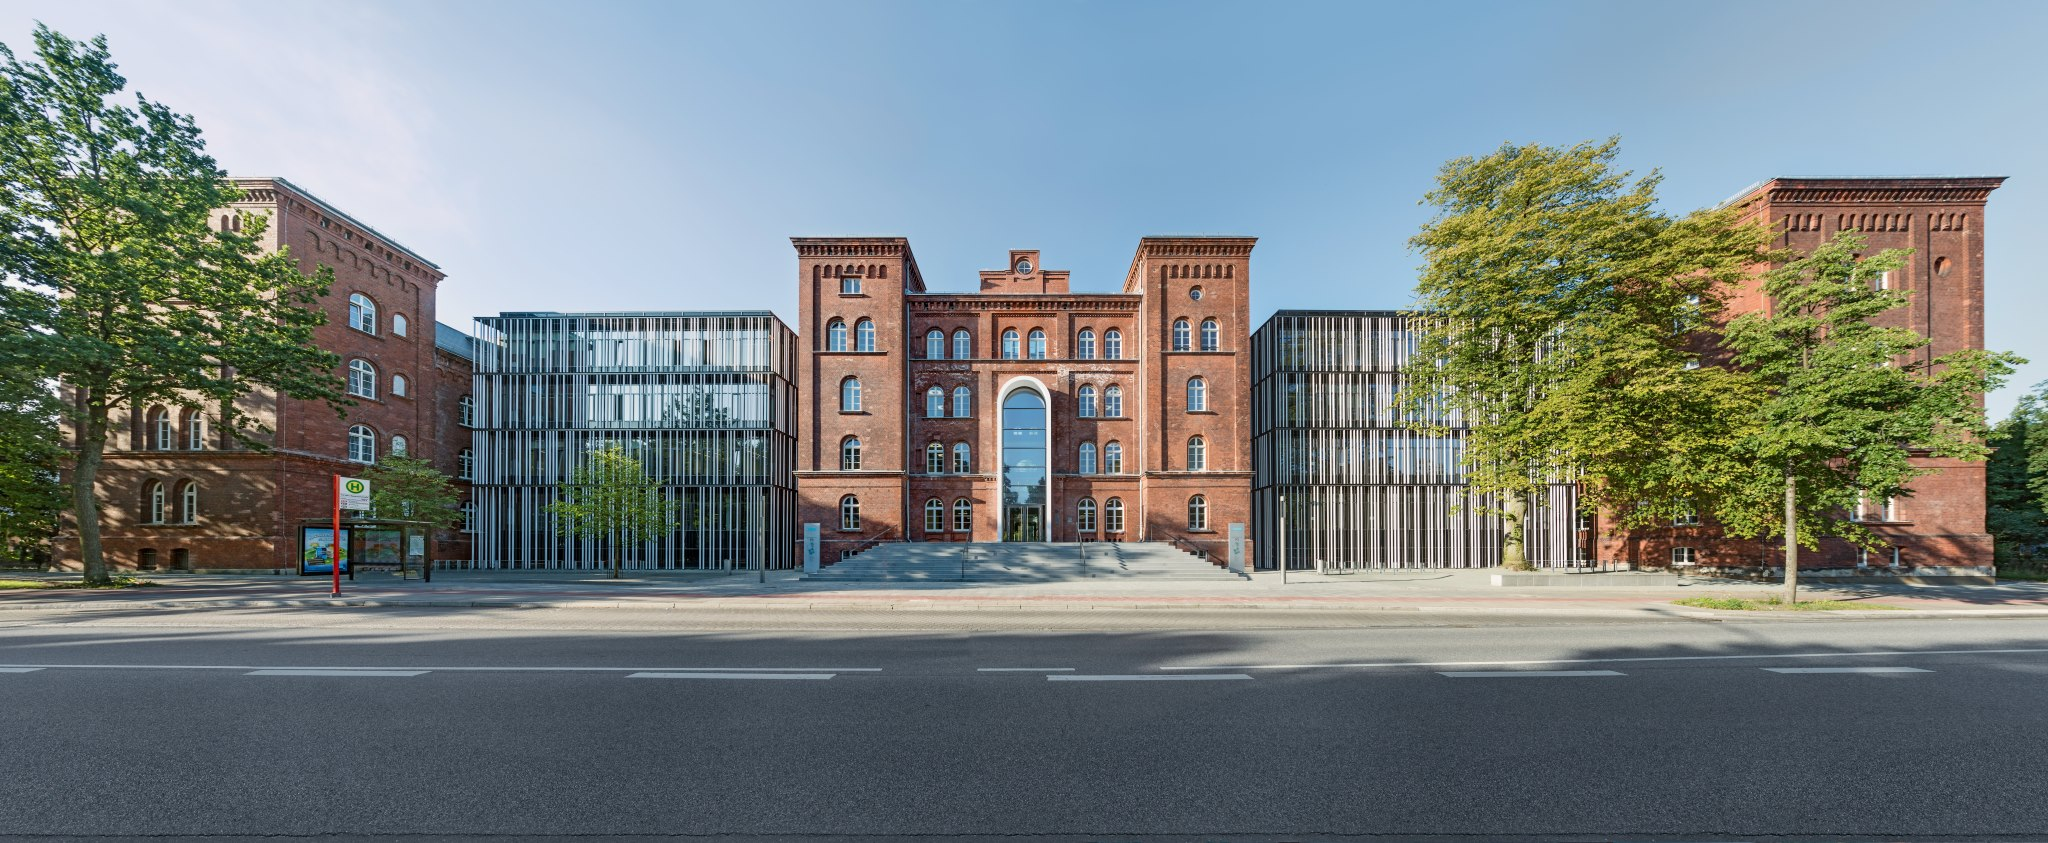 Hamburg University of Technology – TUHH Campus